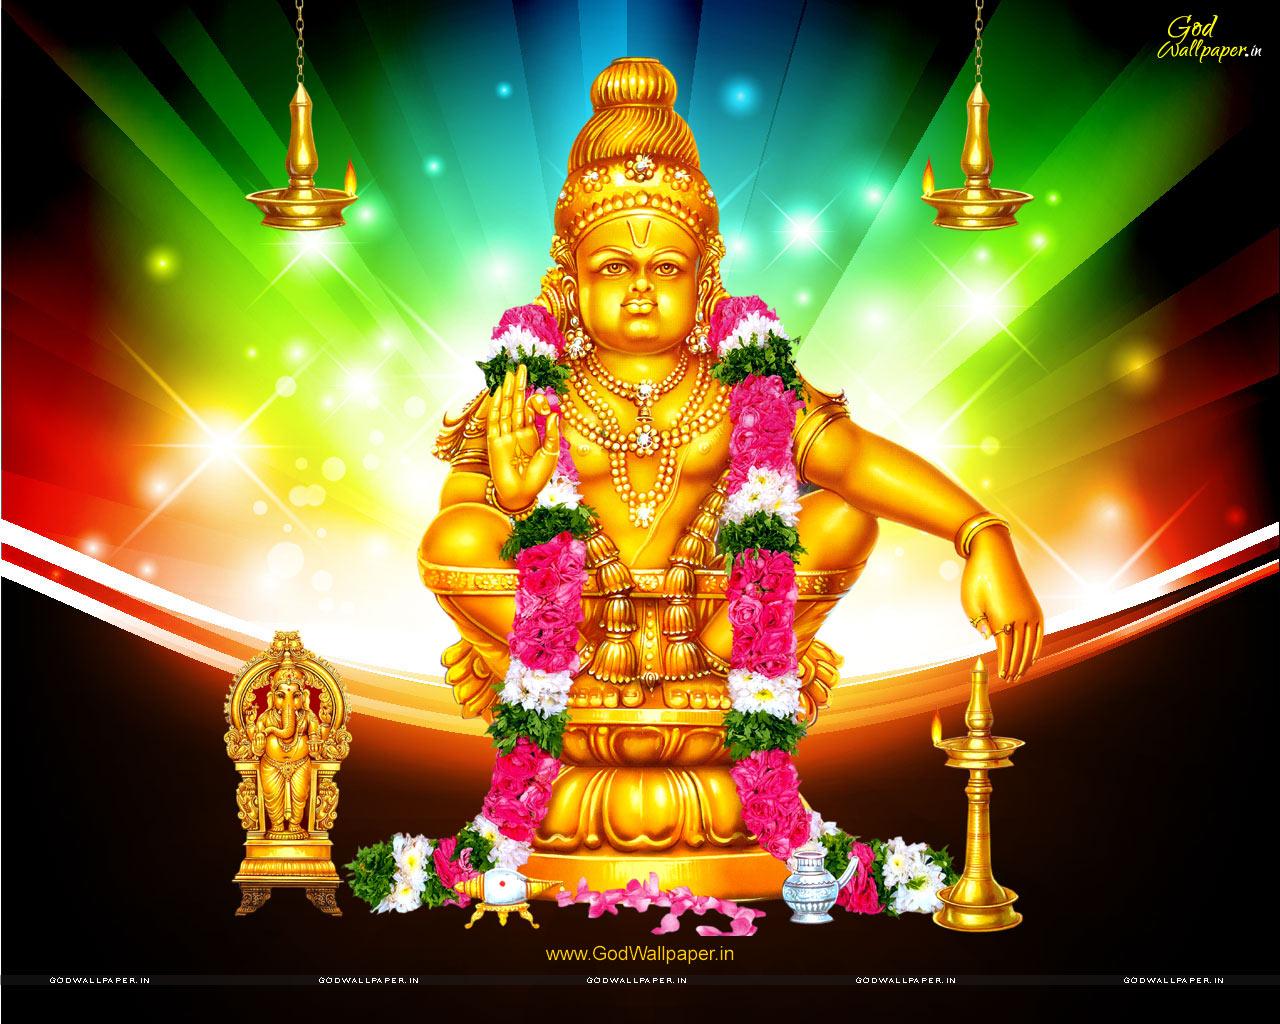 Ayyappa Swamy Hd Wallpapers 1280x1024px